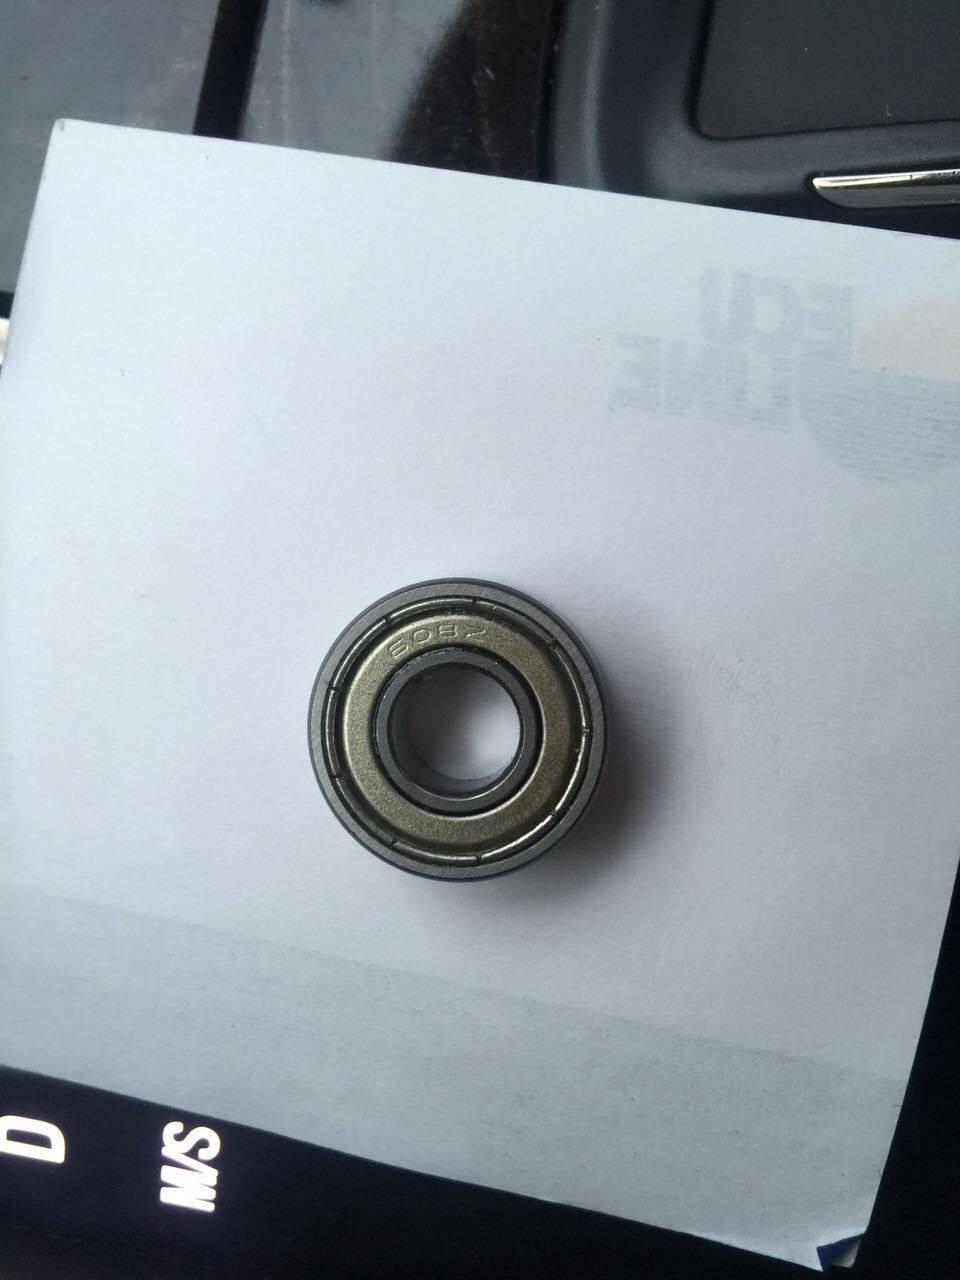 6201 zz 2rs  open deep groove ball bearing chrome steel  good quality